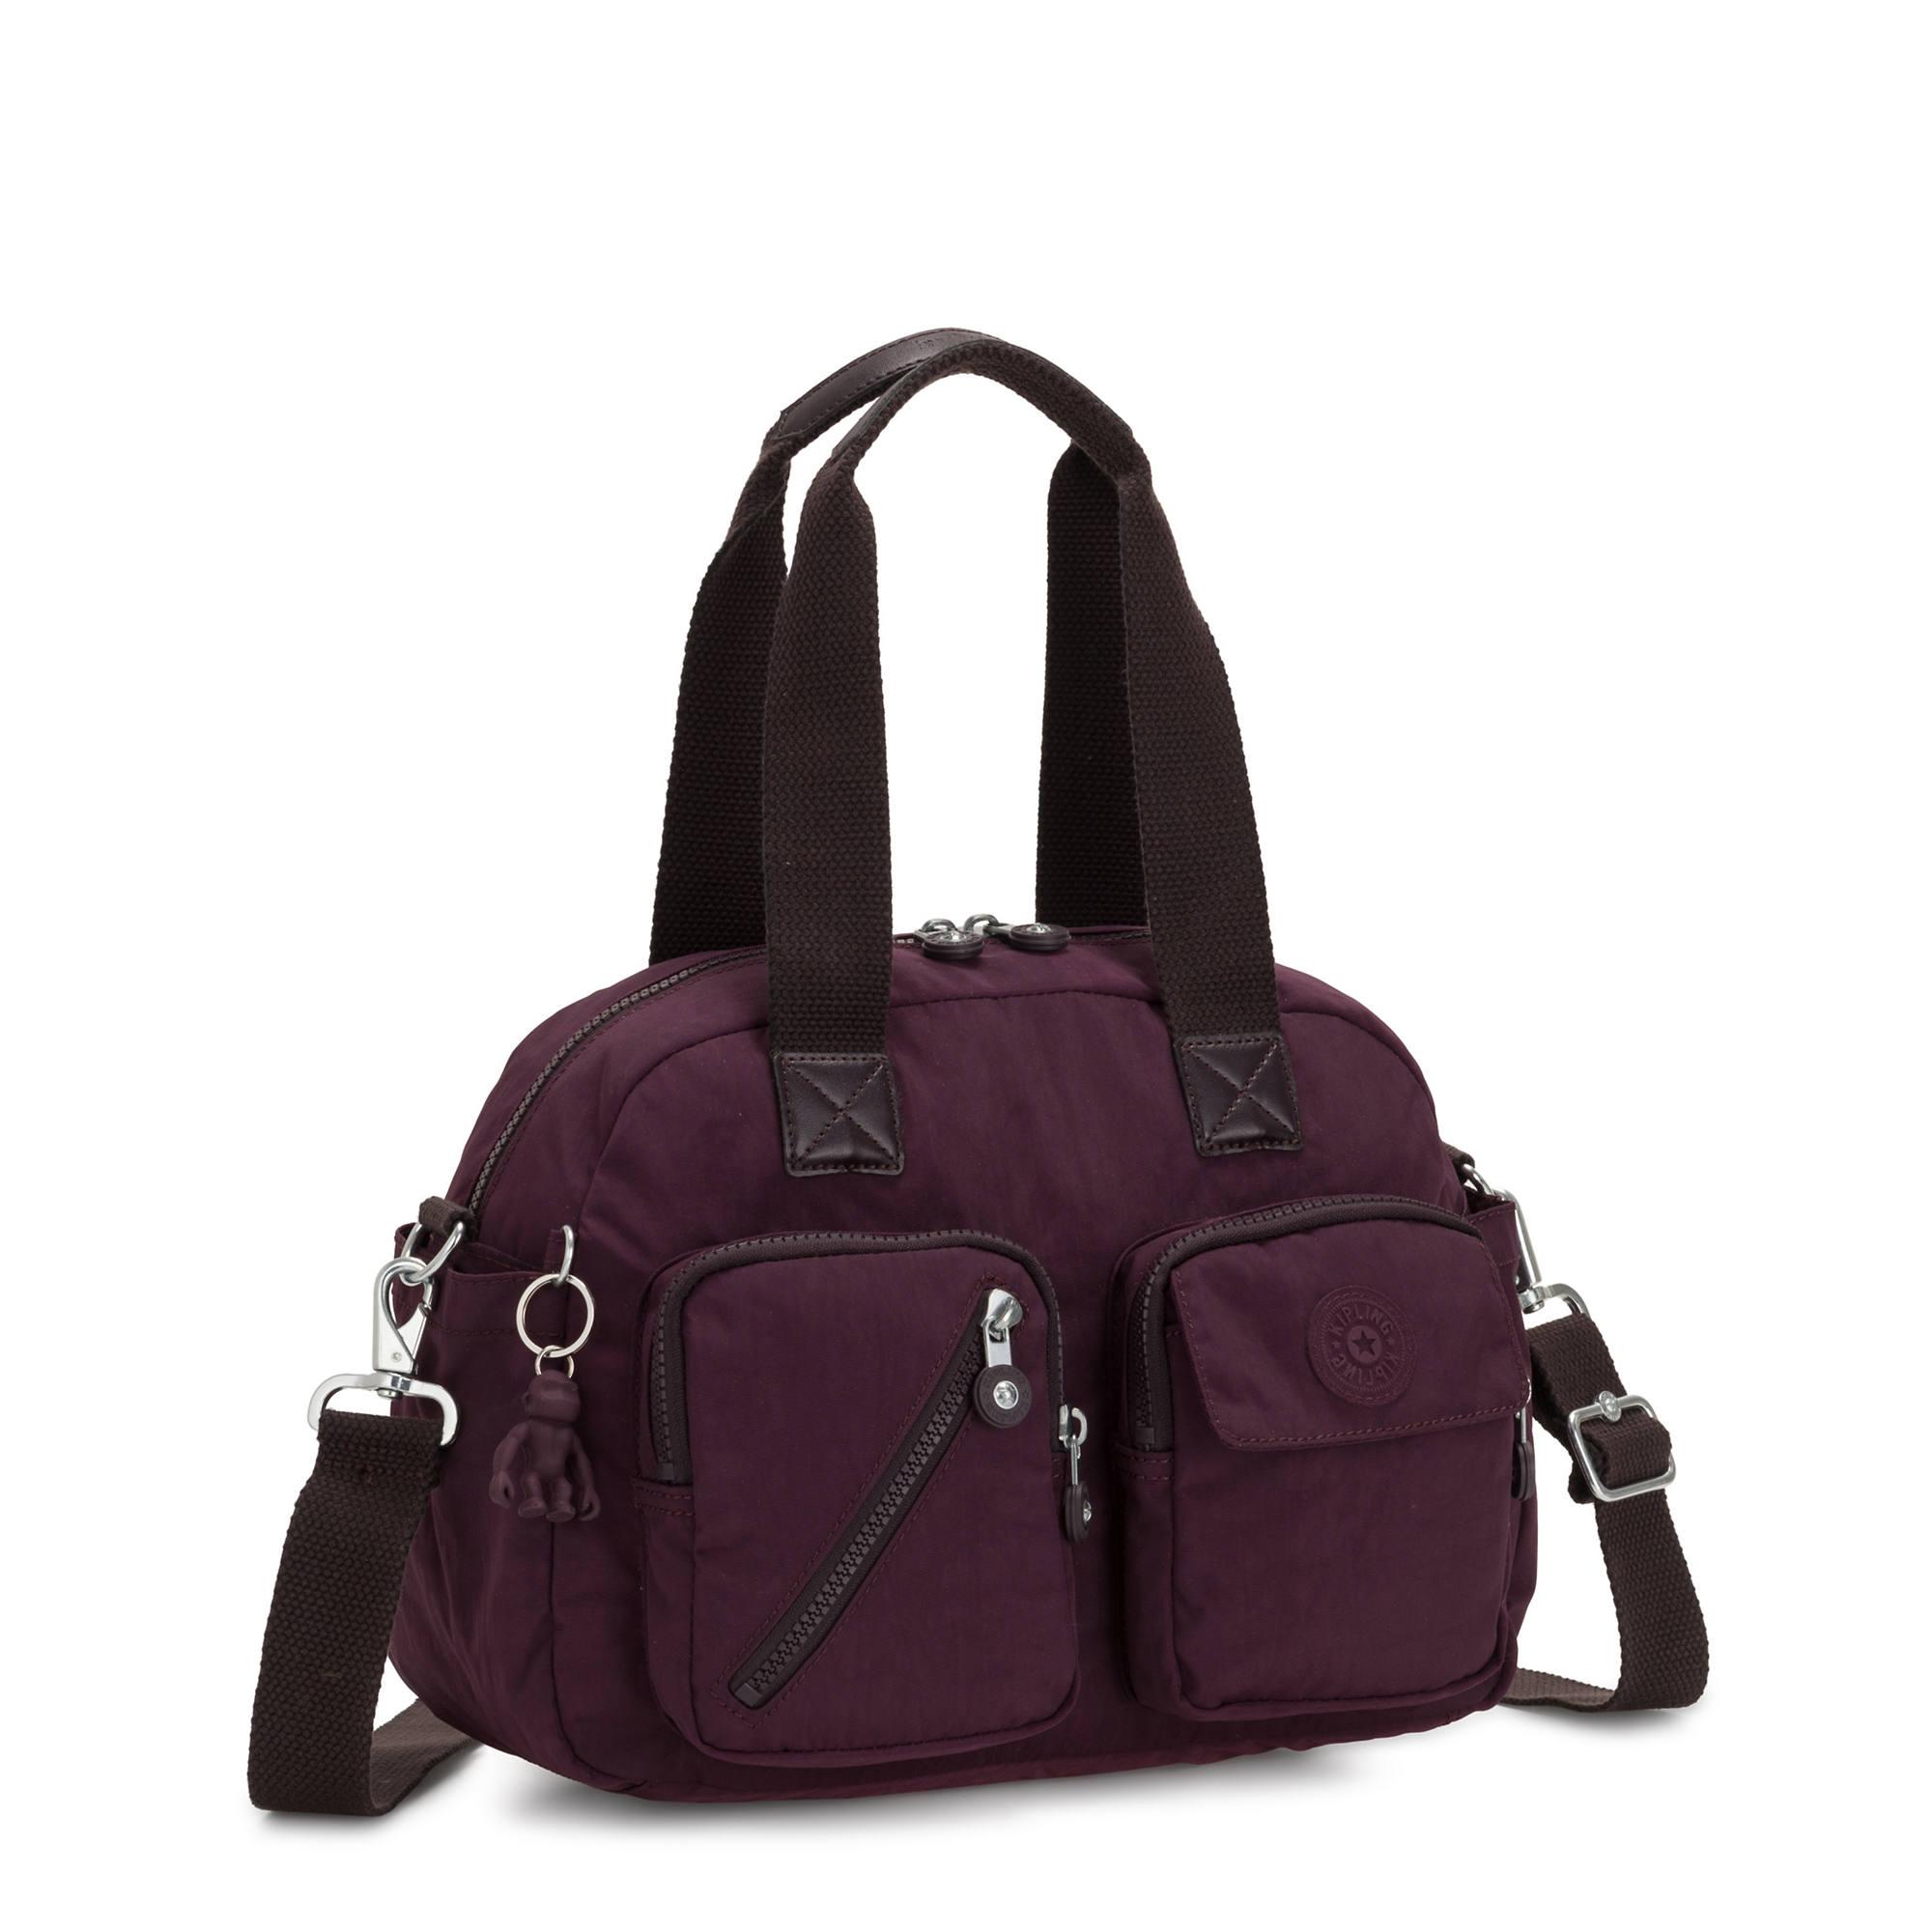 Kipling-Defea-Handbag miniatura 4